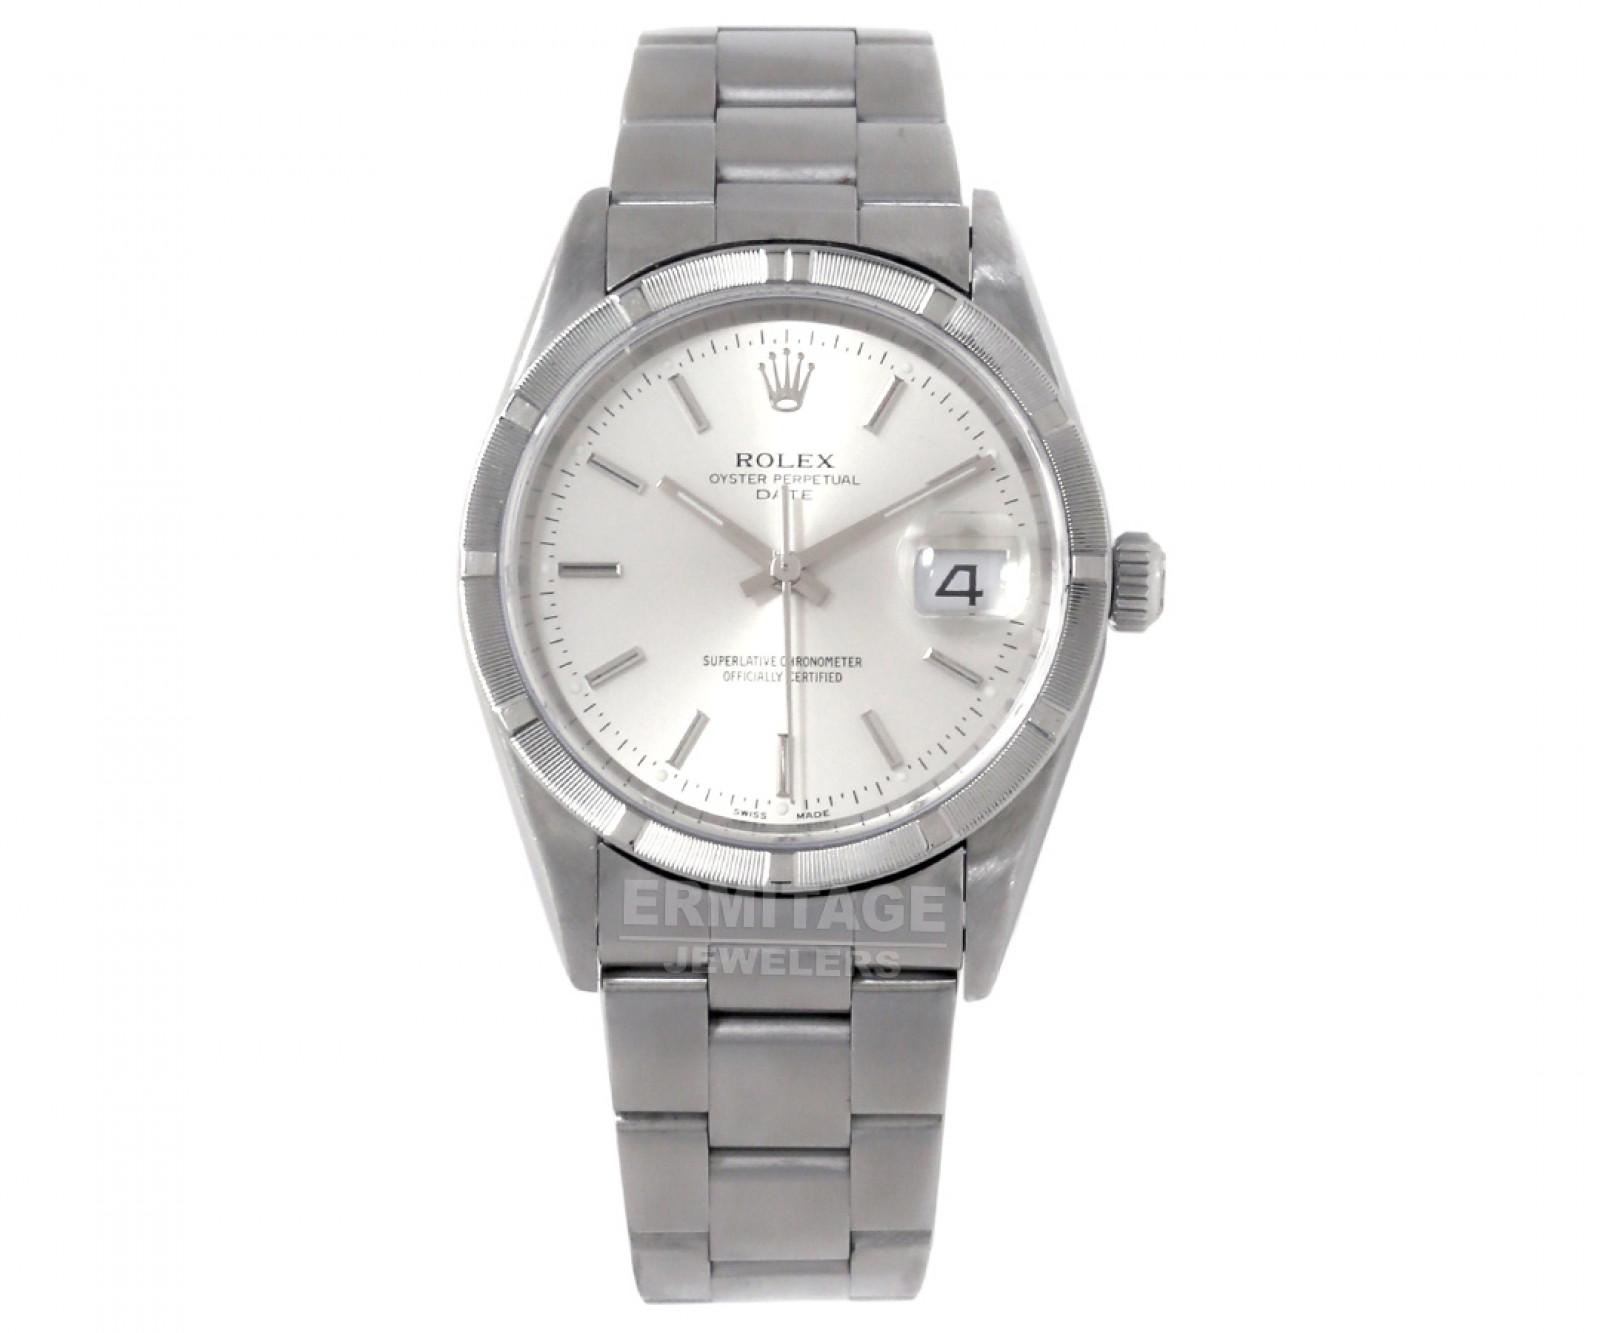 Rolex Oyster Perpetual Date 15210